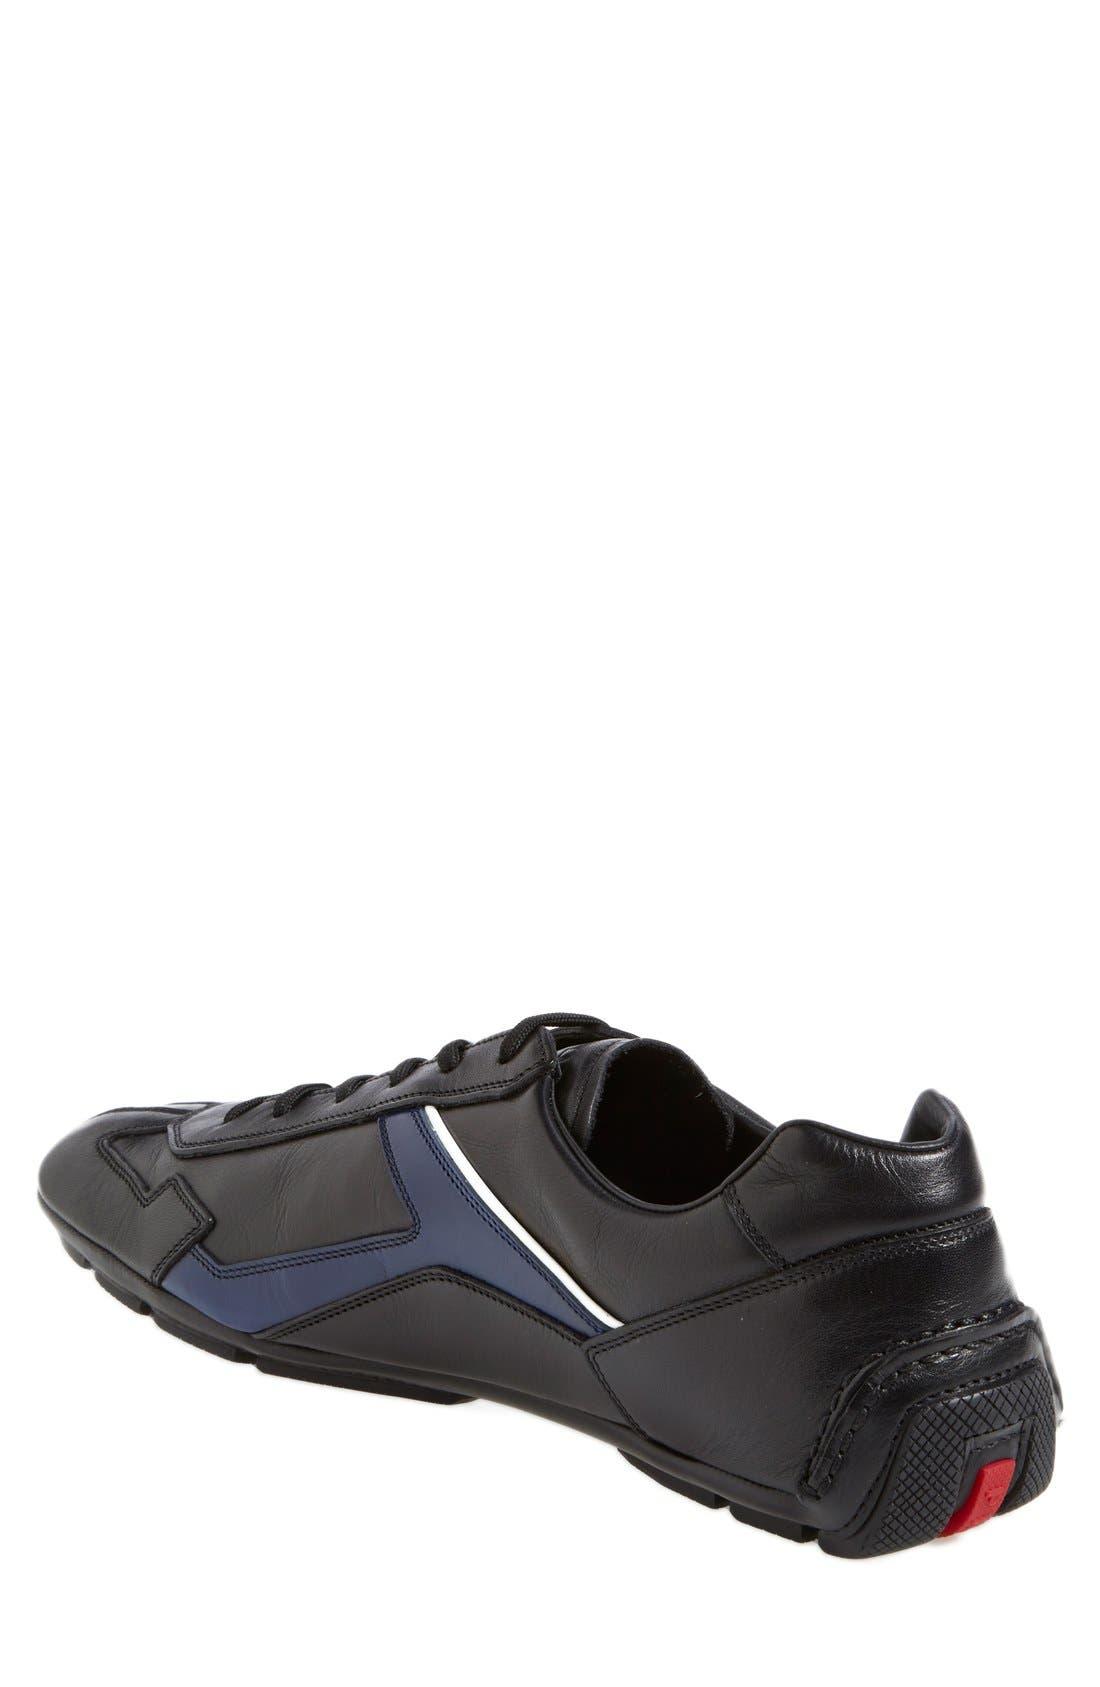 'Monte Carlo' Sneaker,                             Alternate thumbnail 4, color,                             001